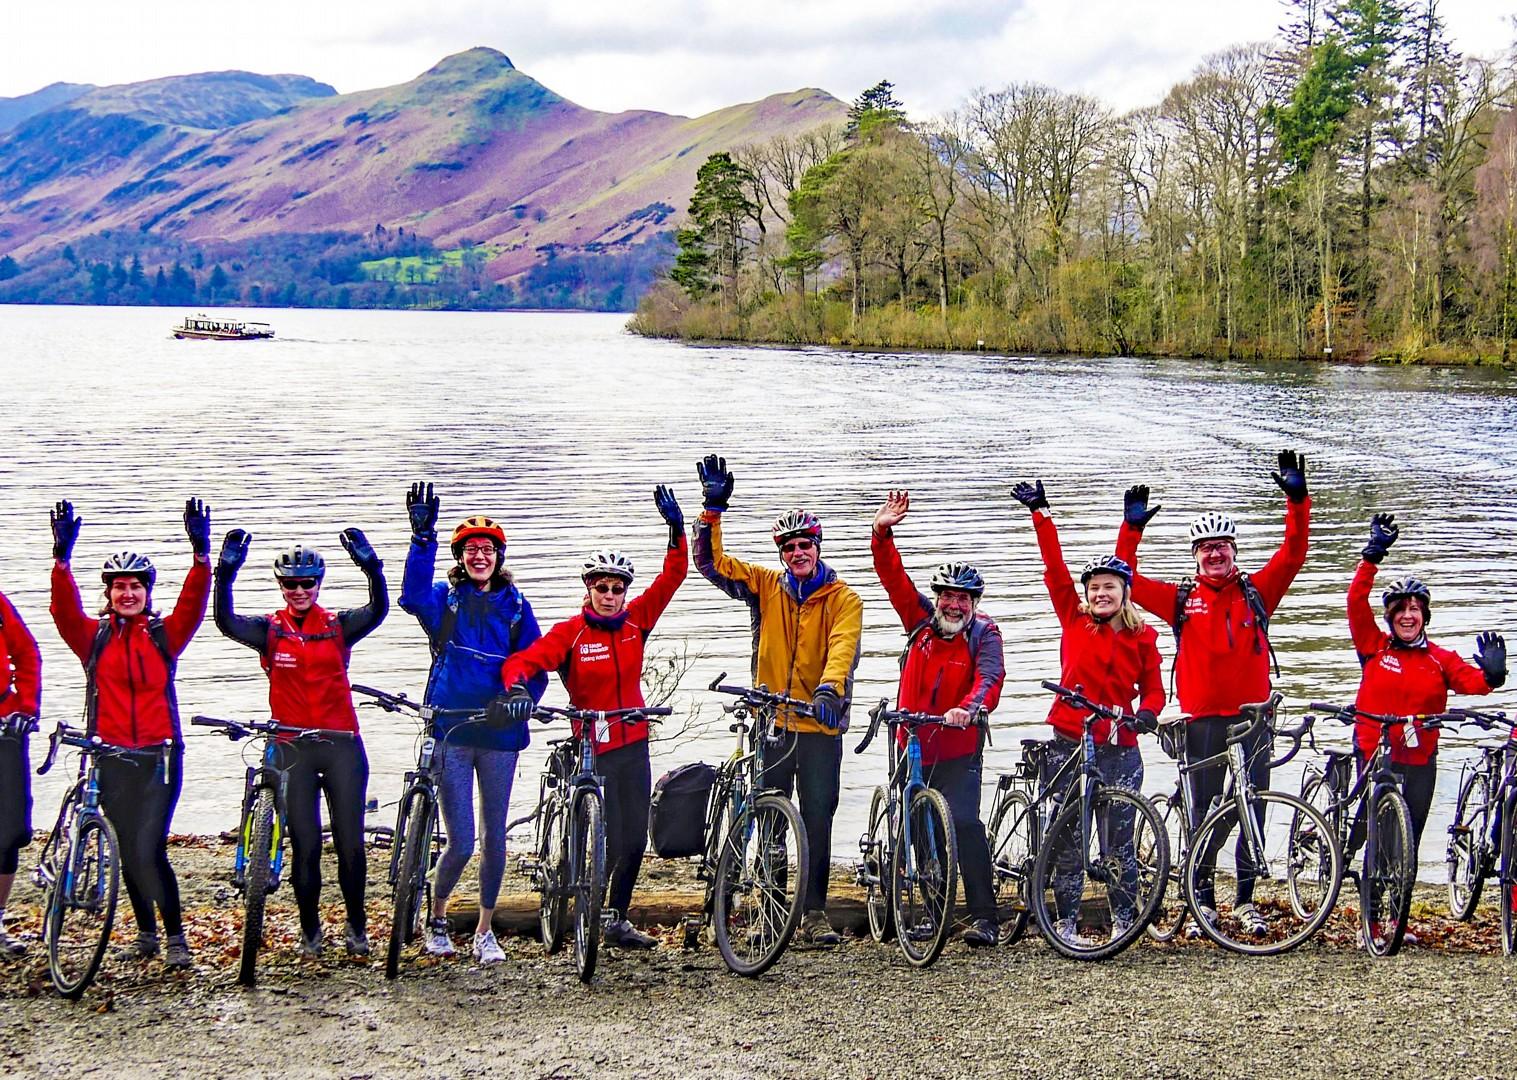 happy-fun-family-friends-guided-group-cycling-tour-lake-district.jpg - UK - Lake District - Derwent Water - Guided Leisure Cycling Holiday - Leisure Cycling